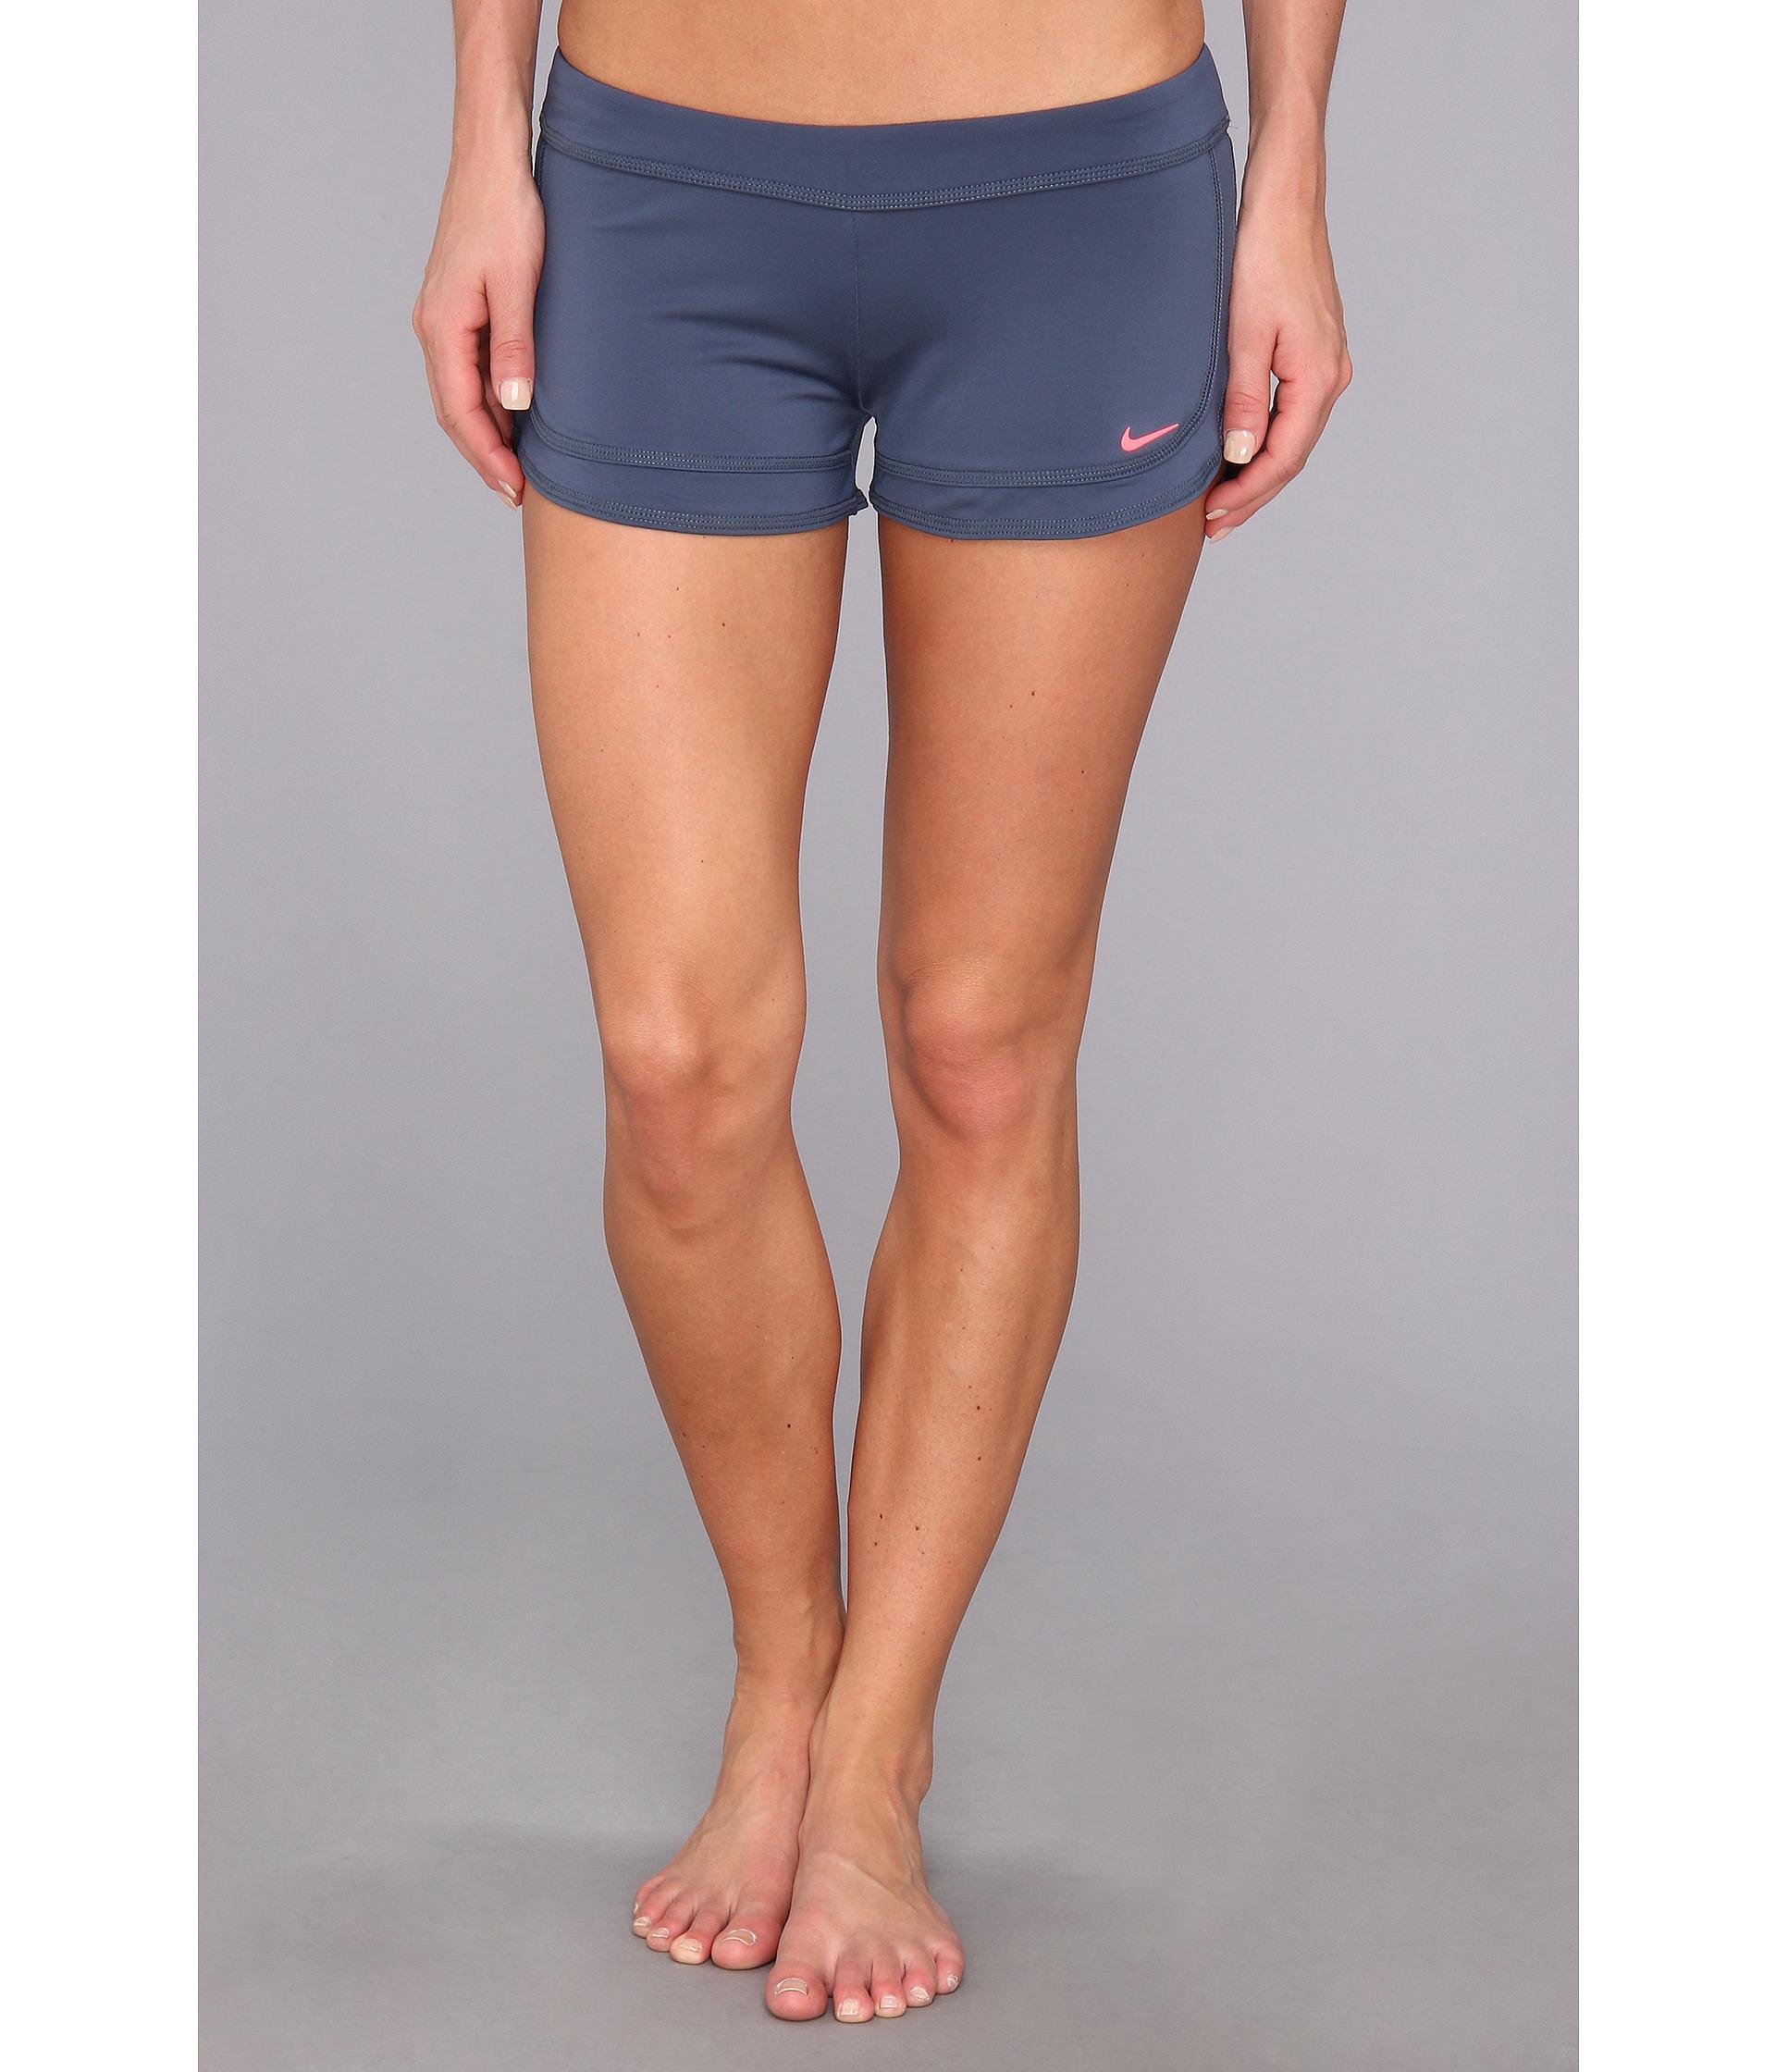 edaf25869d7a3 Nike Cover Ups Swim Short in Blue - Lyst